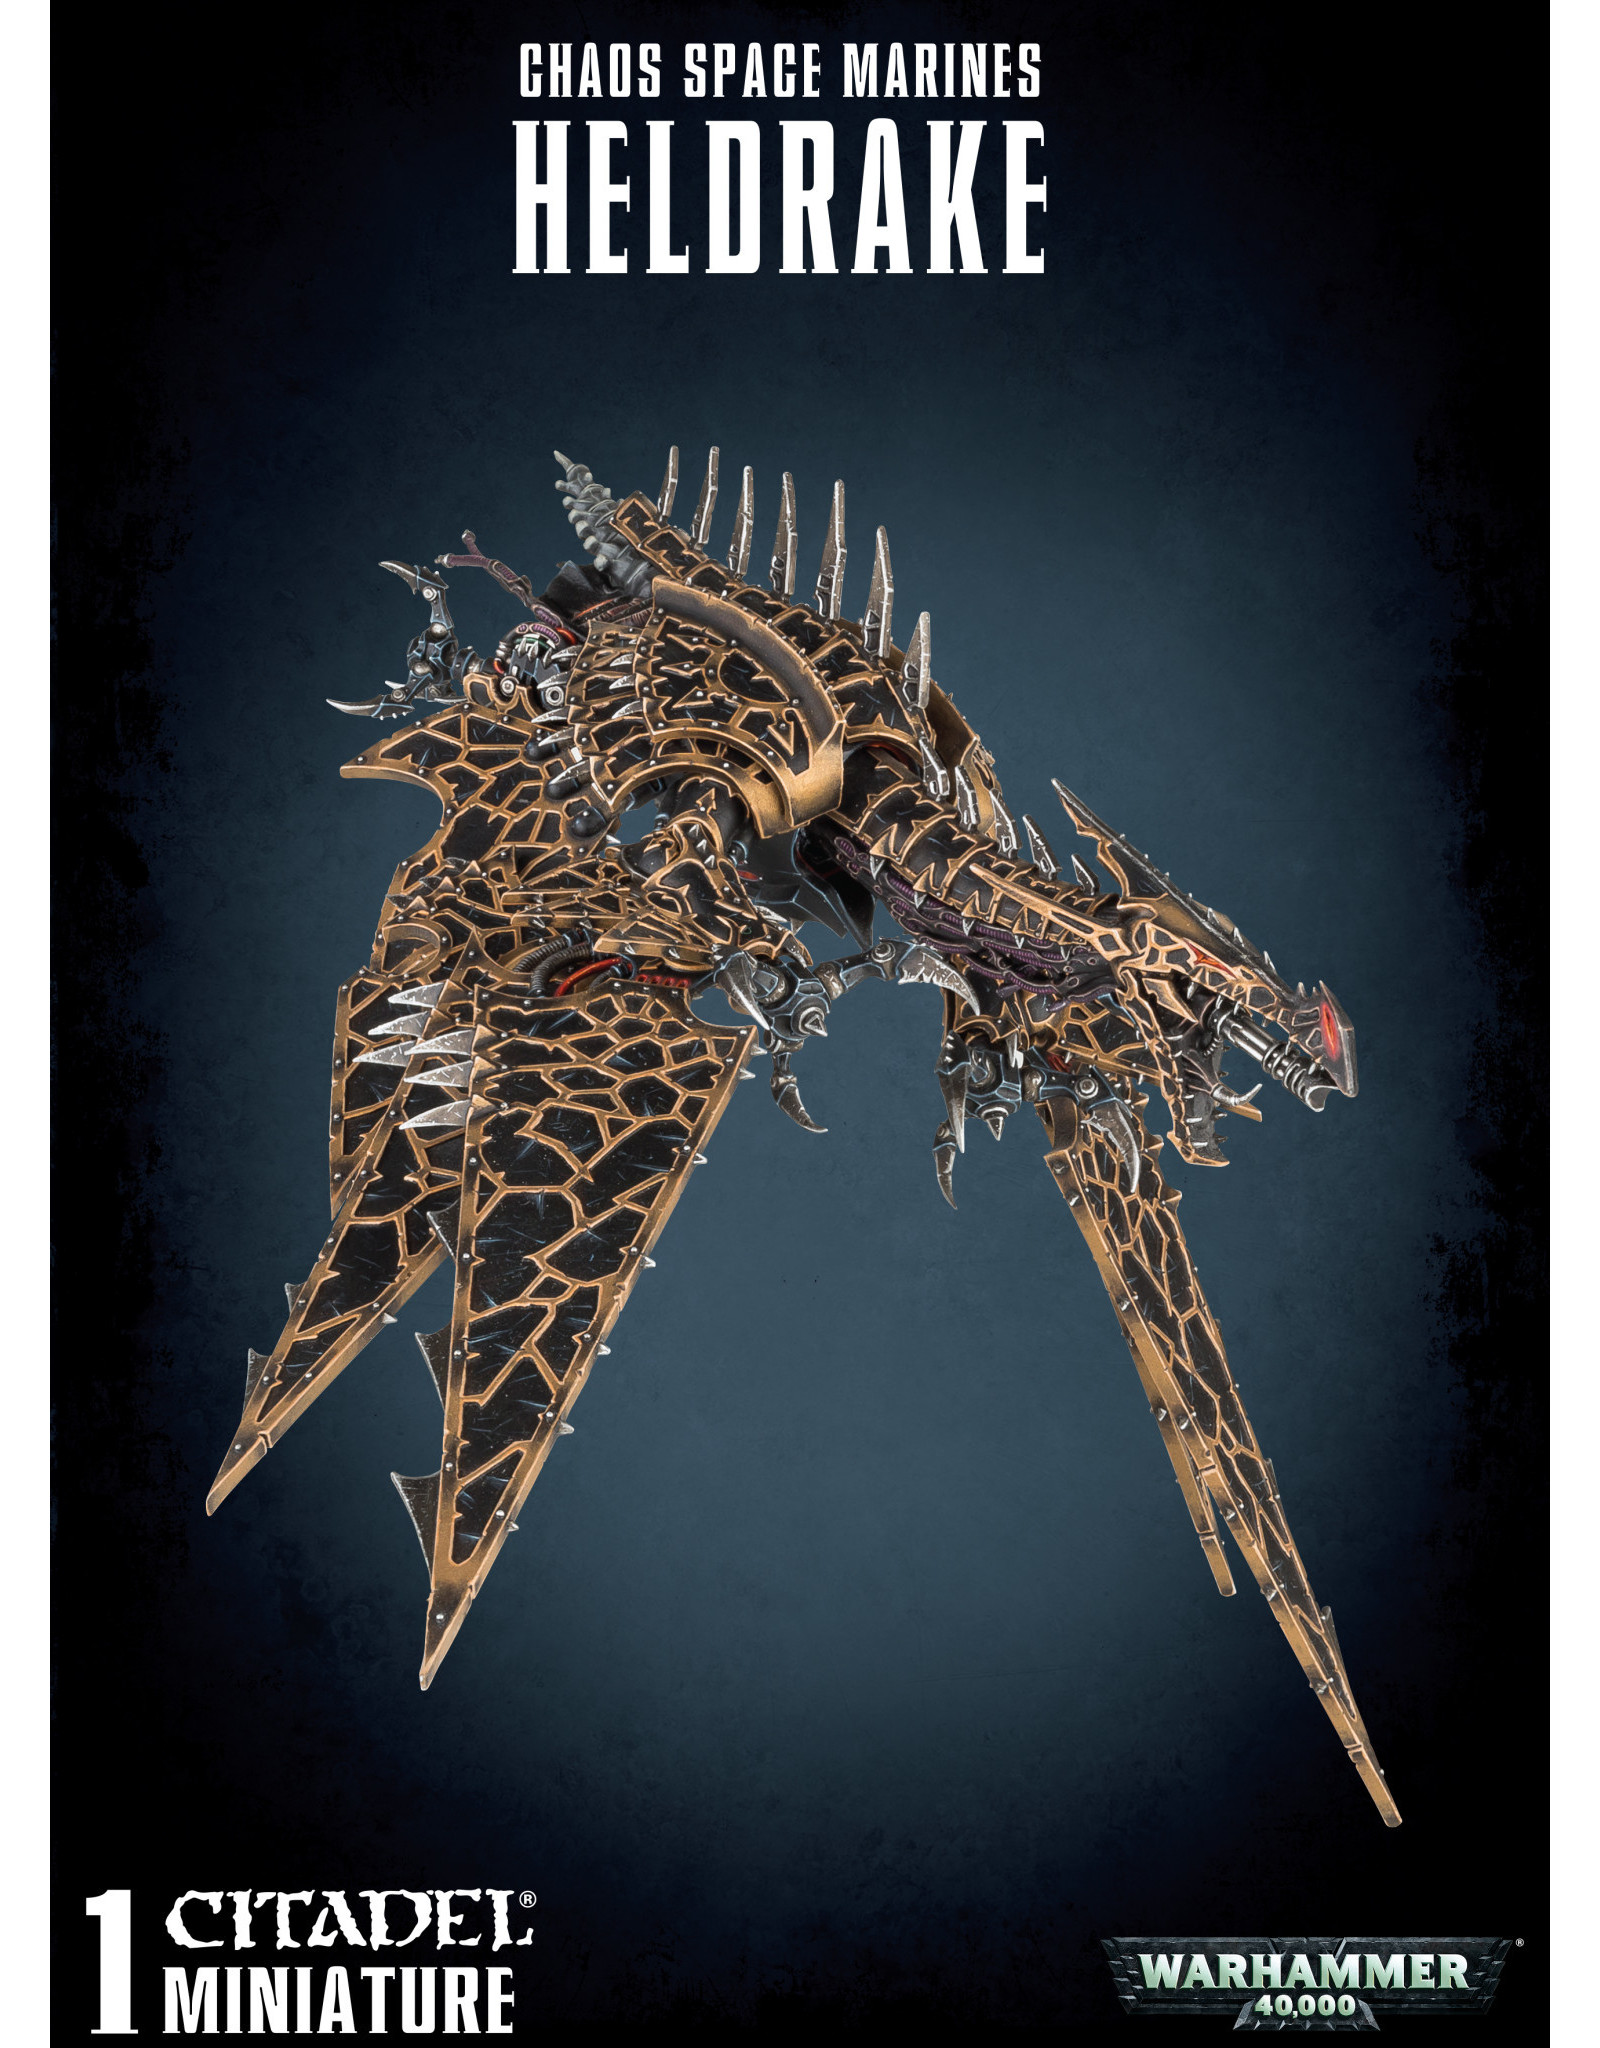 Warhammer 40,000 Chaos Space Marines: Heldrake